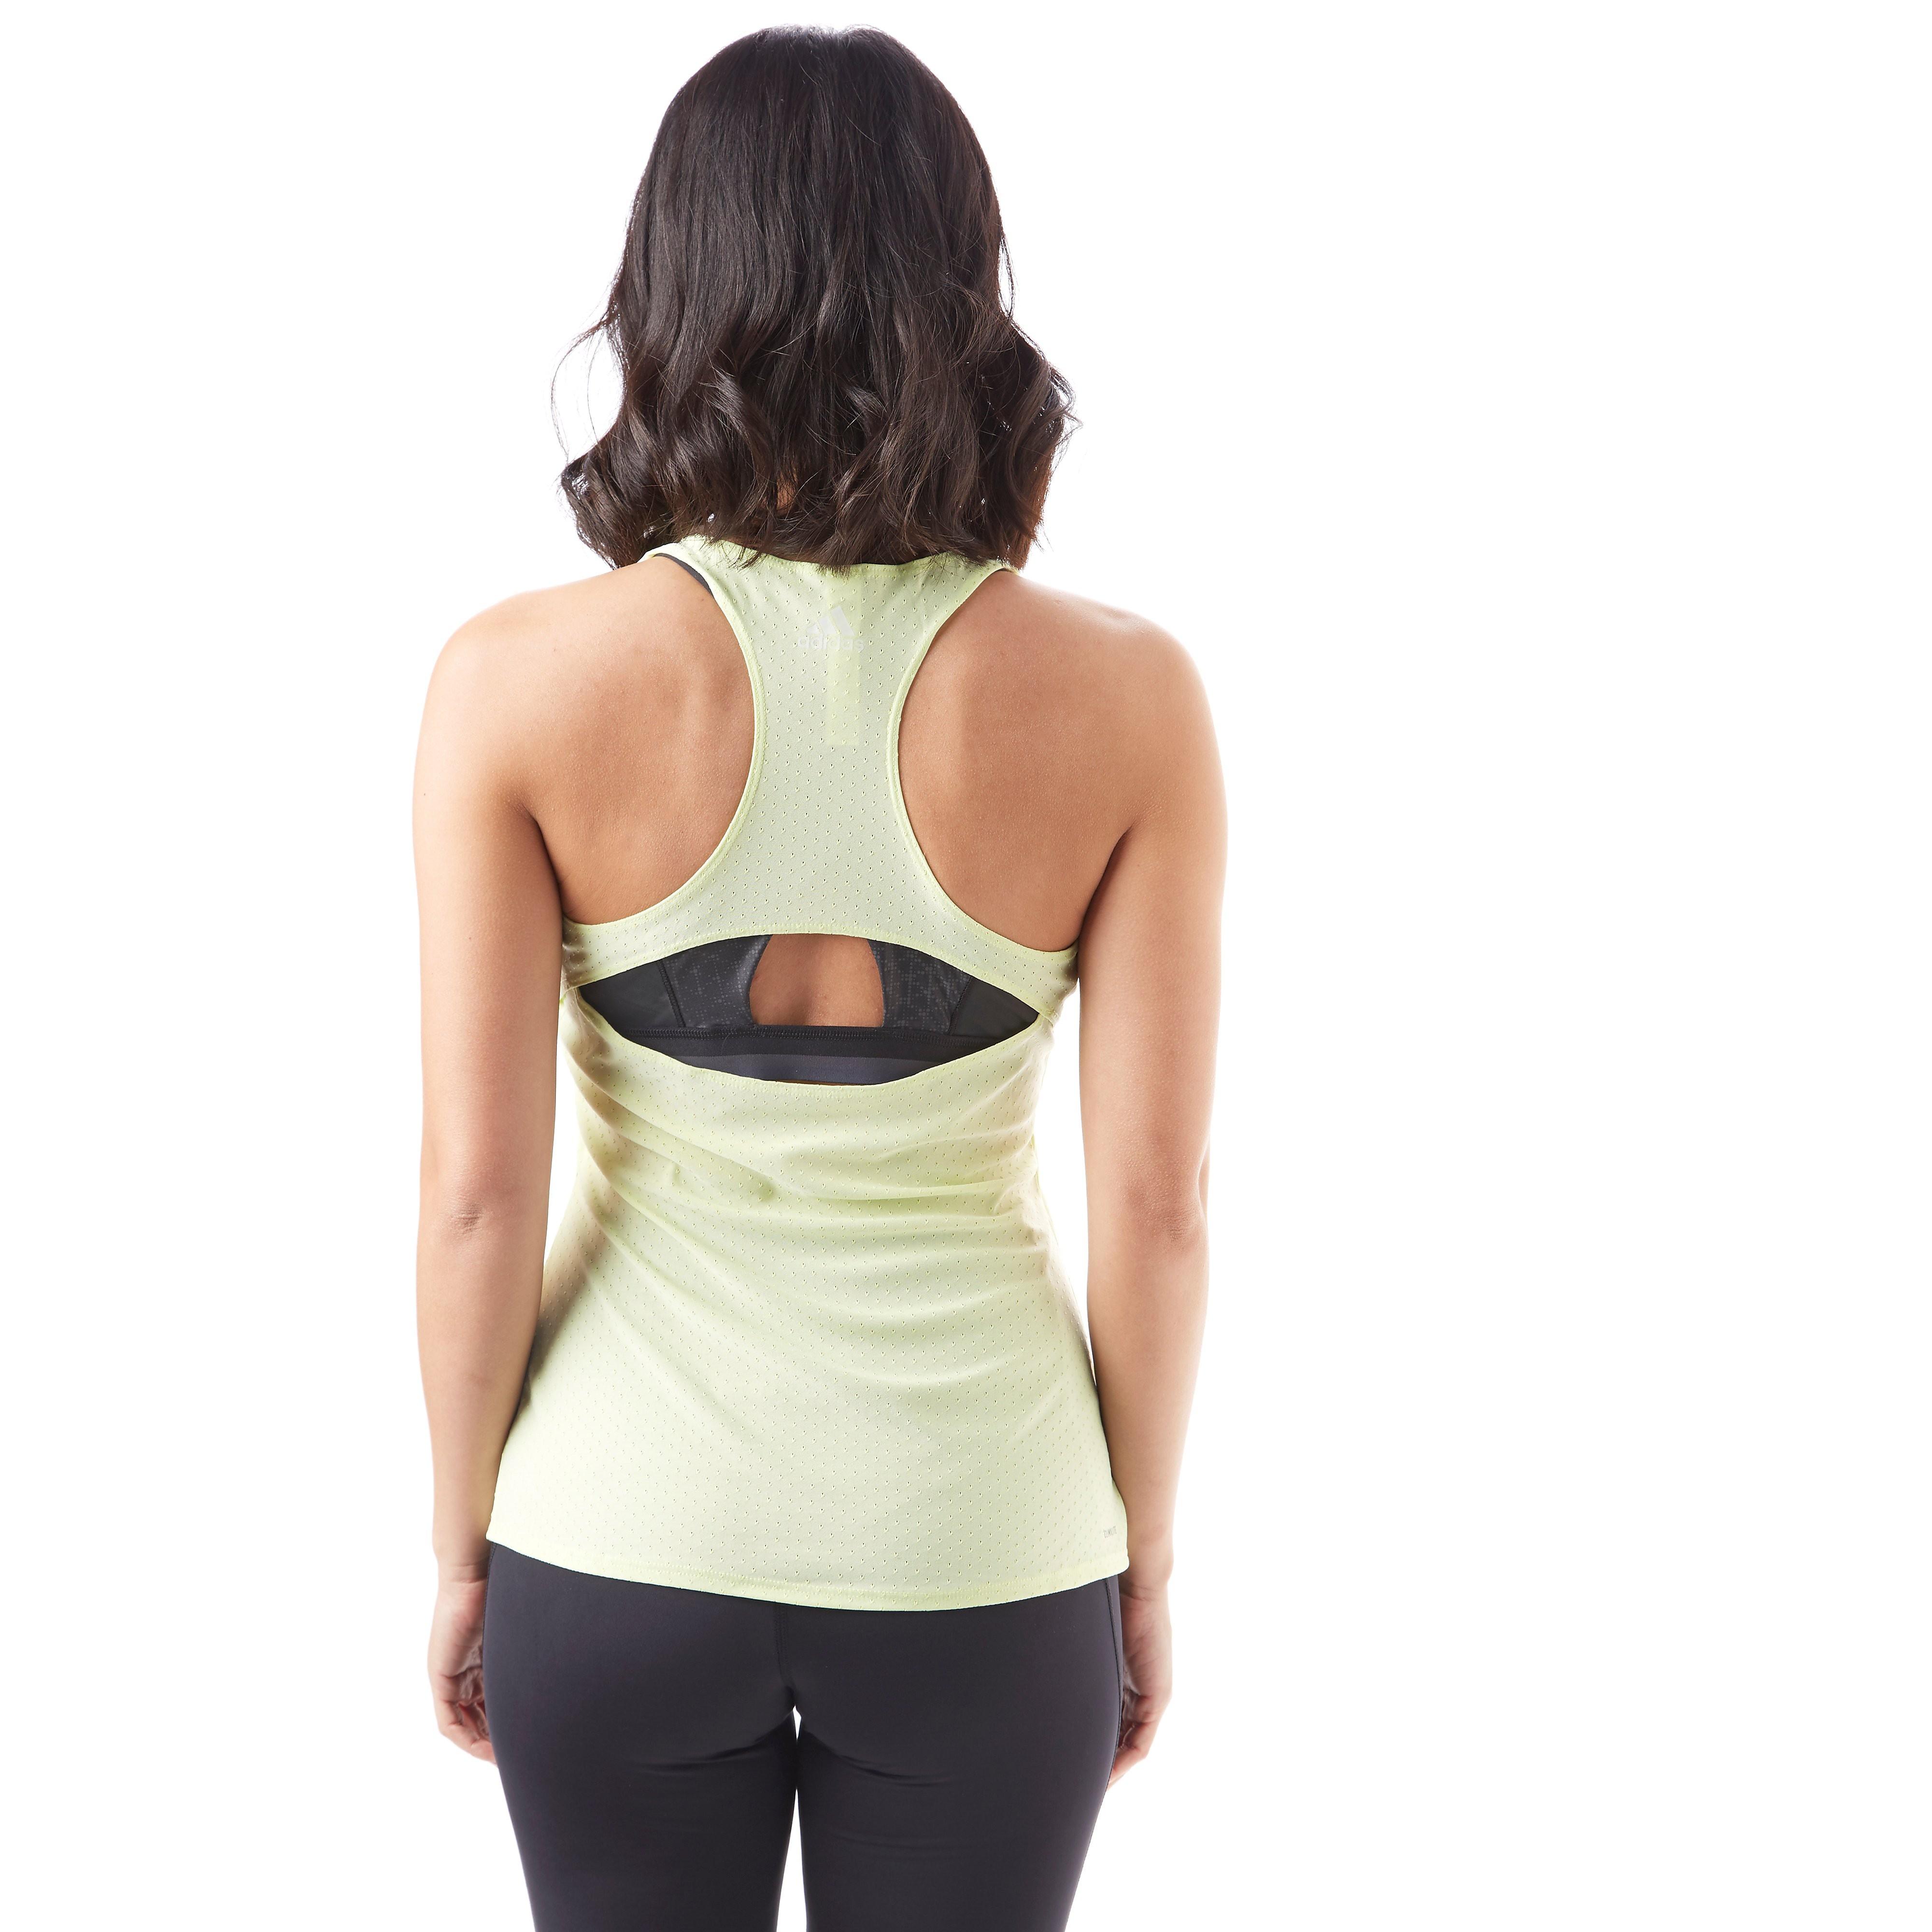 adidas Graphic Women's Training Tank Top